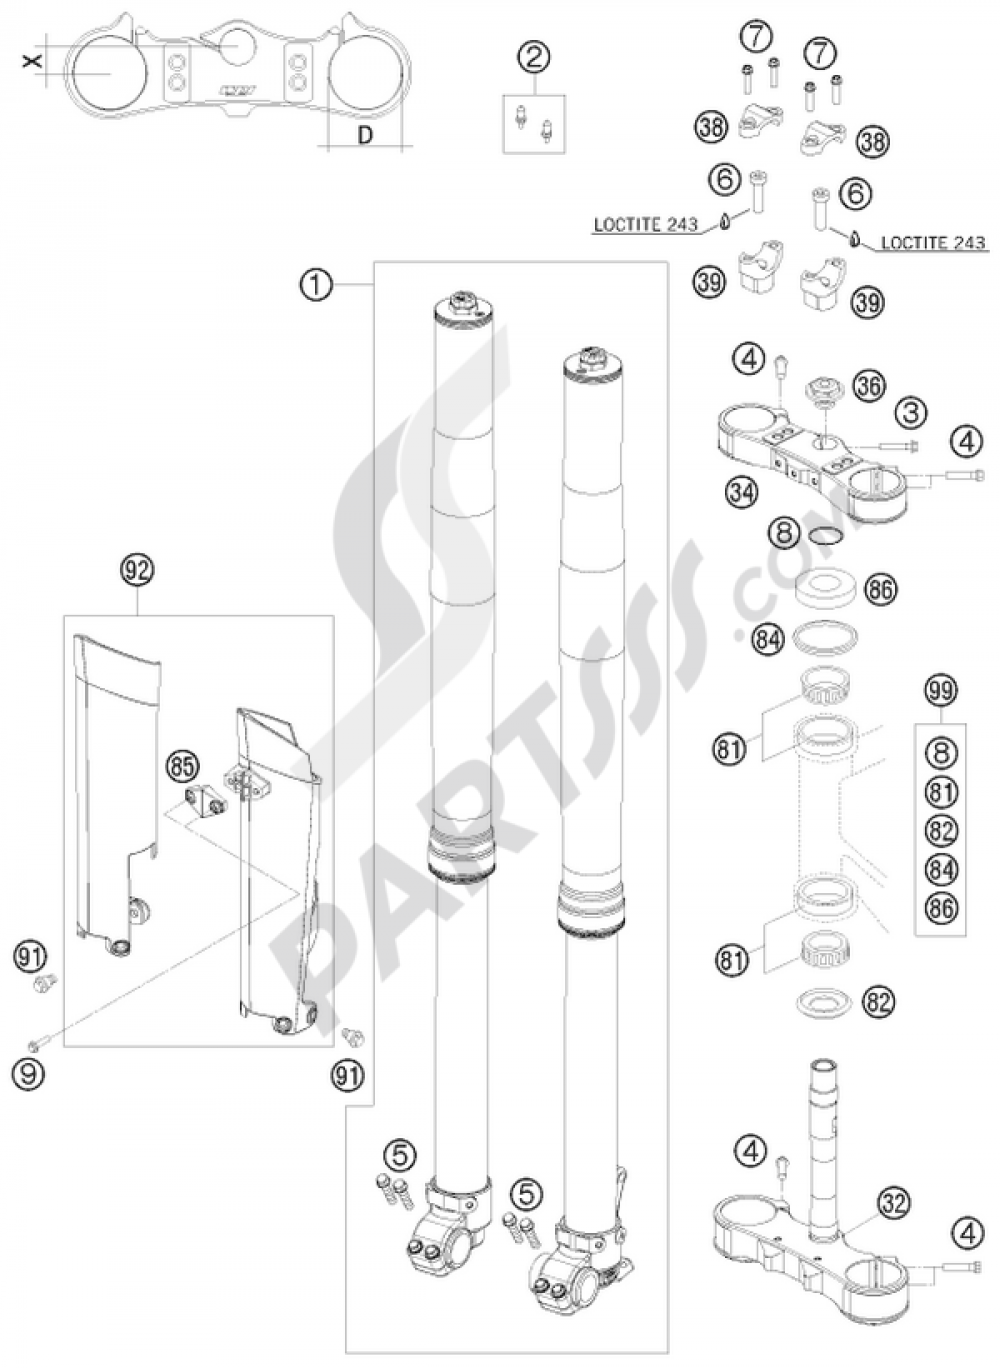 ktm 450 exc 2015 parts manual Pioneer Avh -X491bhs Wiring-Diagram ktm powerparts array front fork triple cl ktm 450 exc six days 2015 eu rh partsss